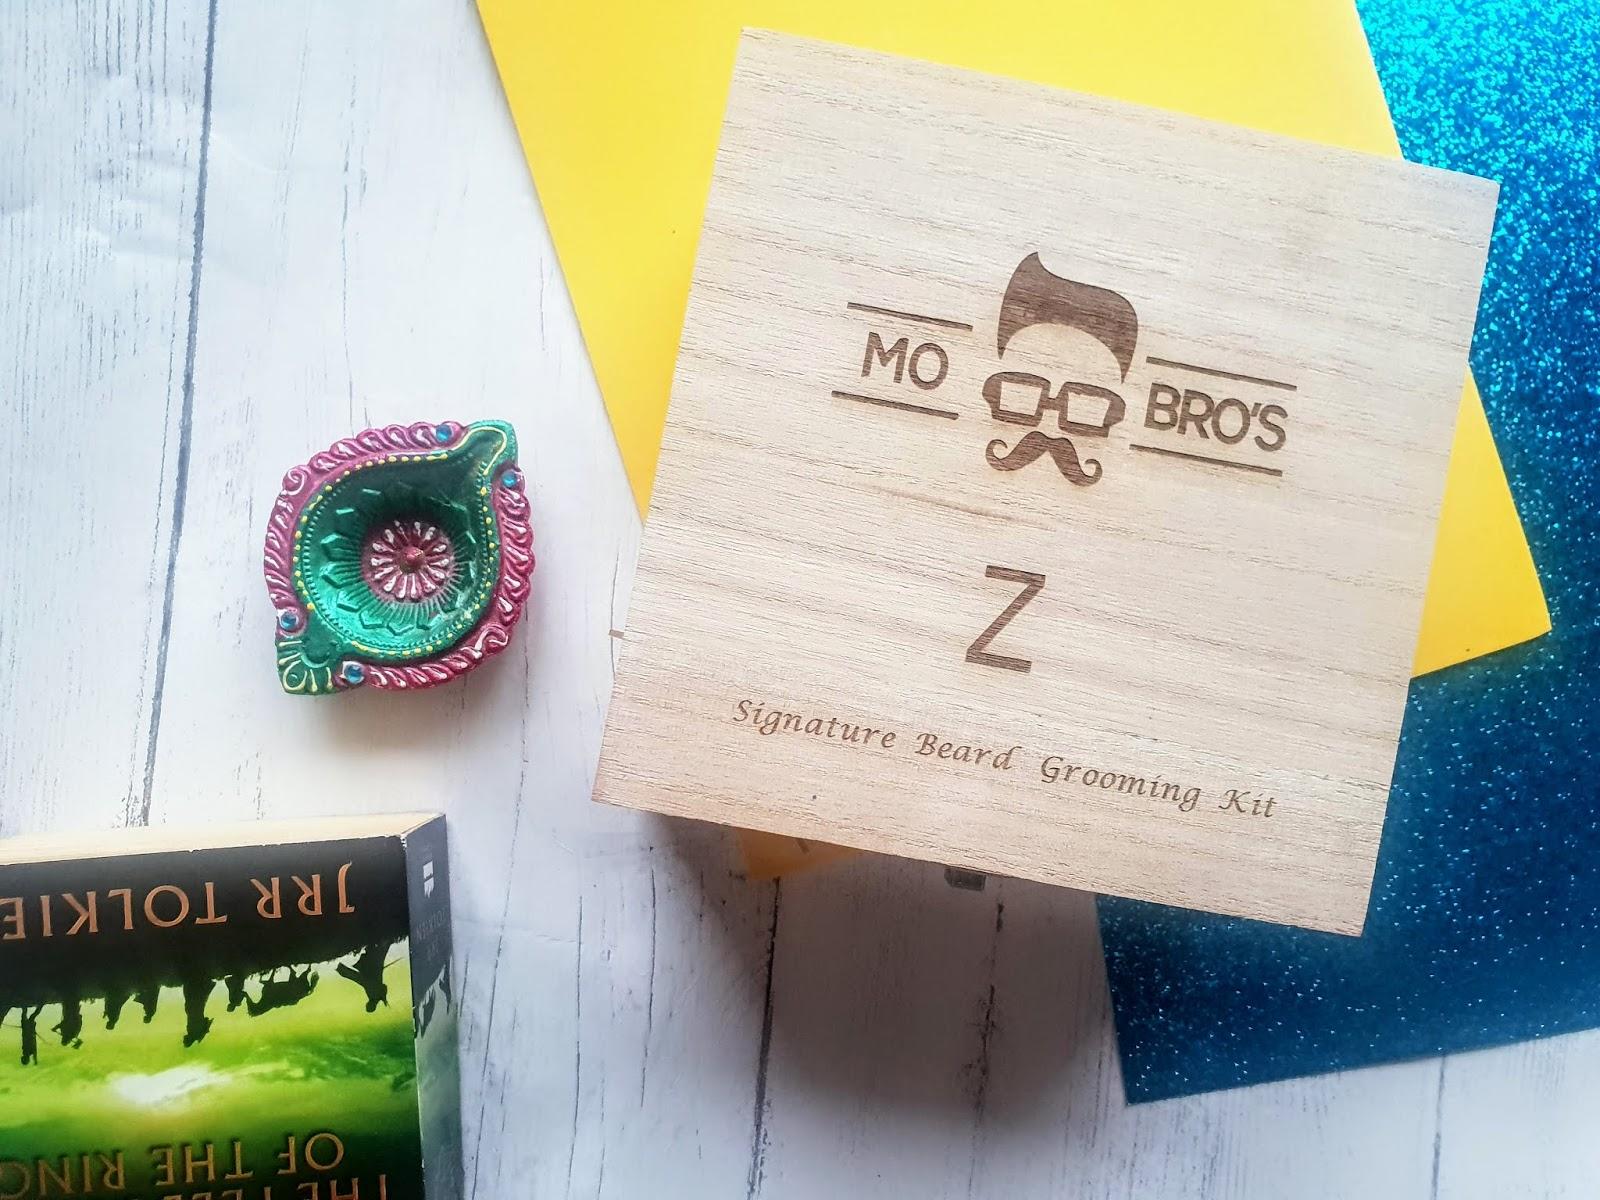 Mo Bro's Signature Wooden Box Collection